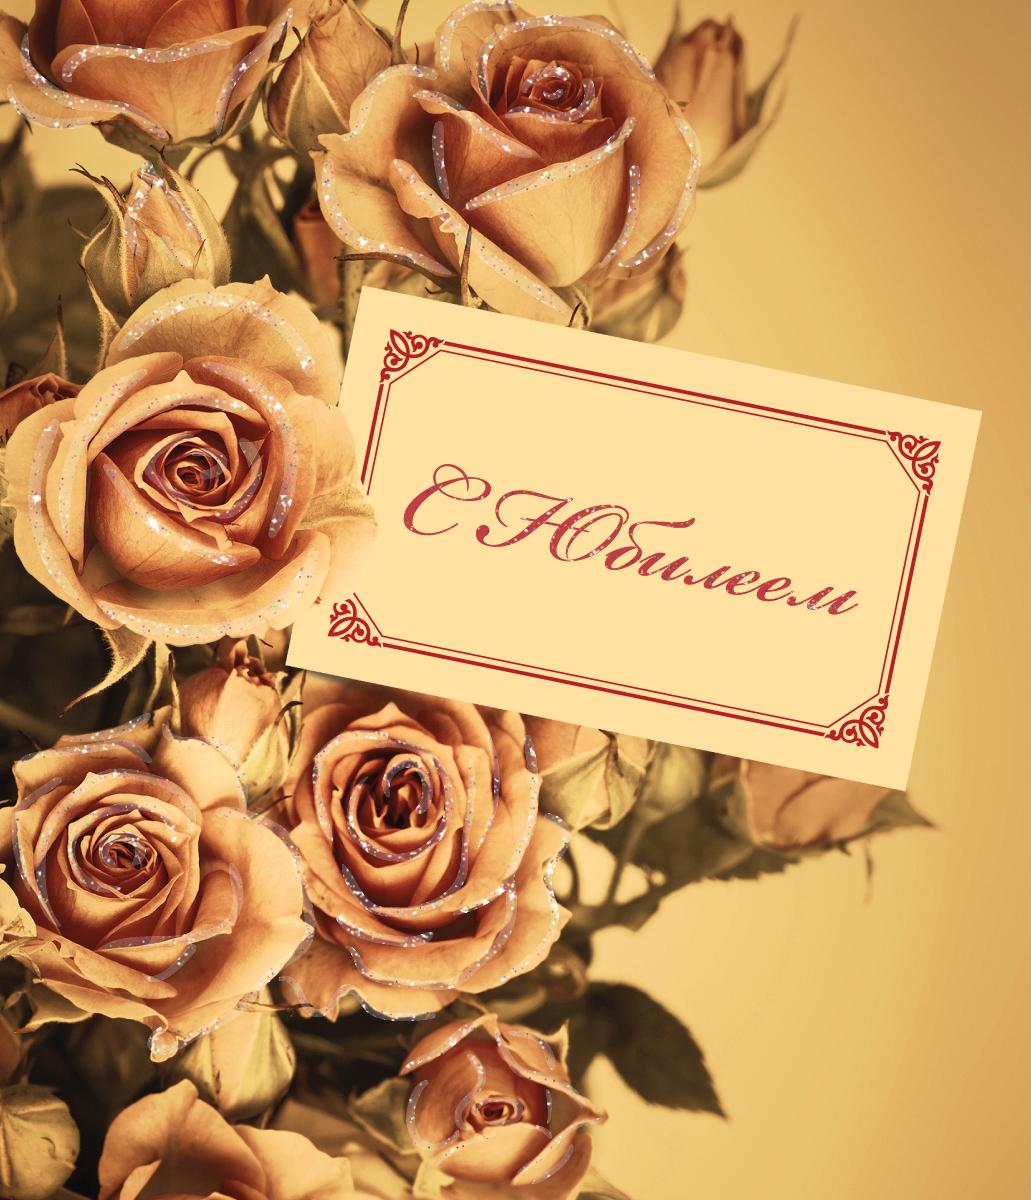 Открытка сувенирная С юбилеем. 273841 ою 0002 открытка конверт с юбилеем студия тётя роза